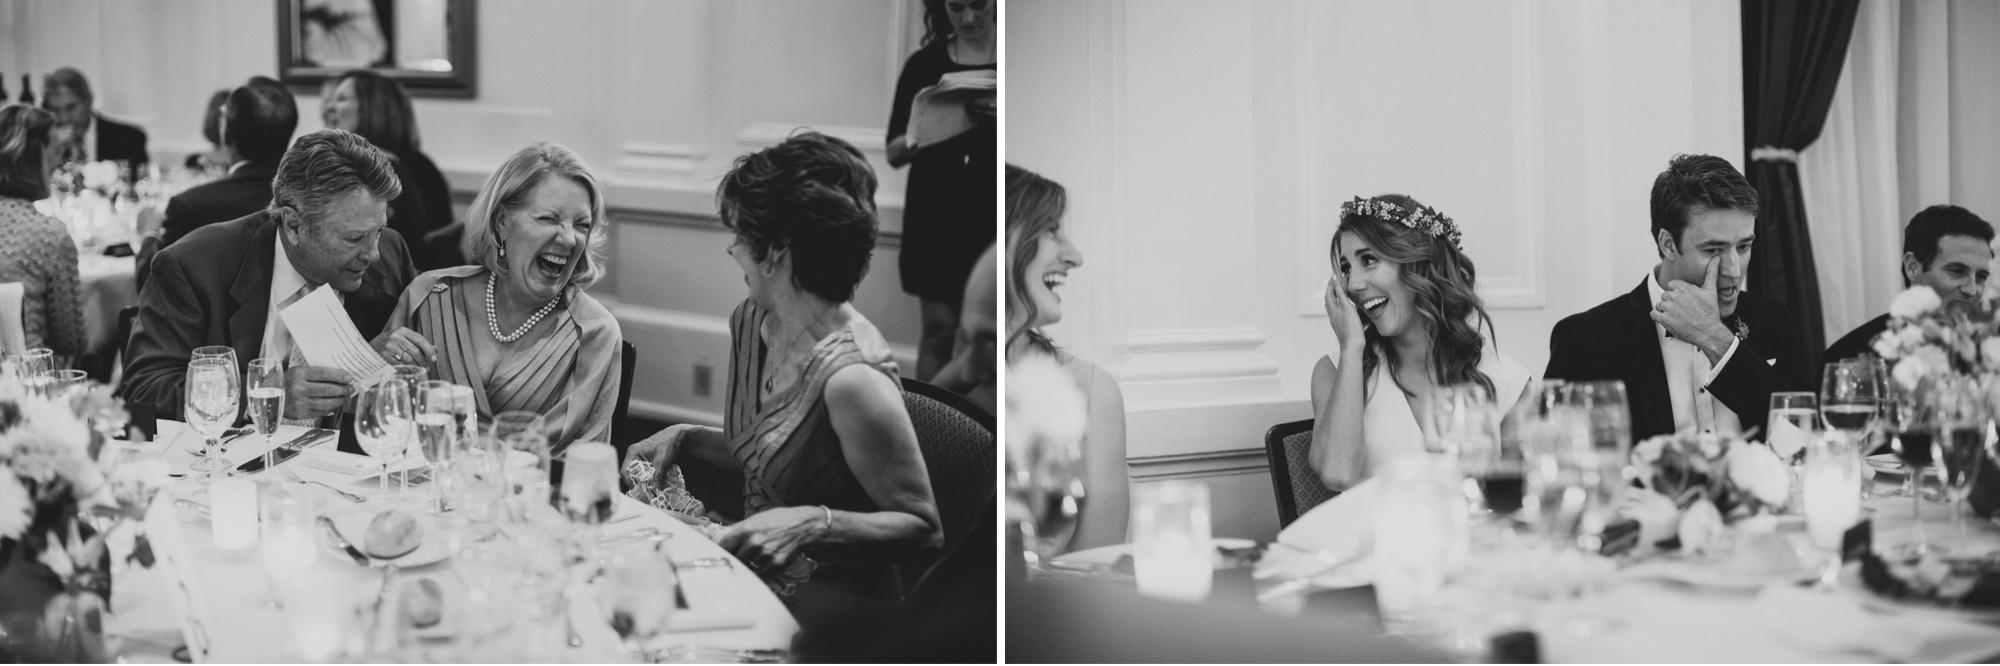 toasts wedding